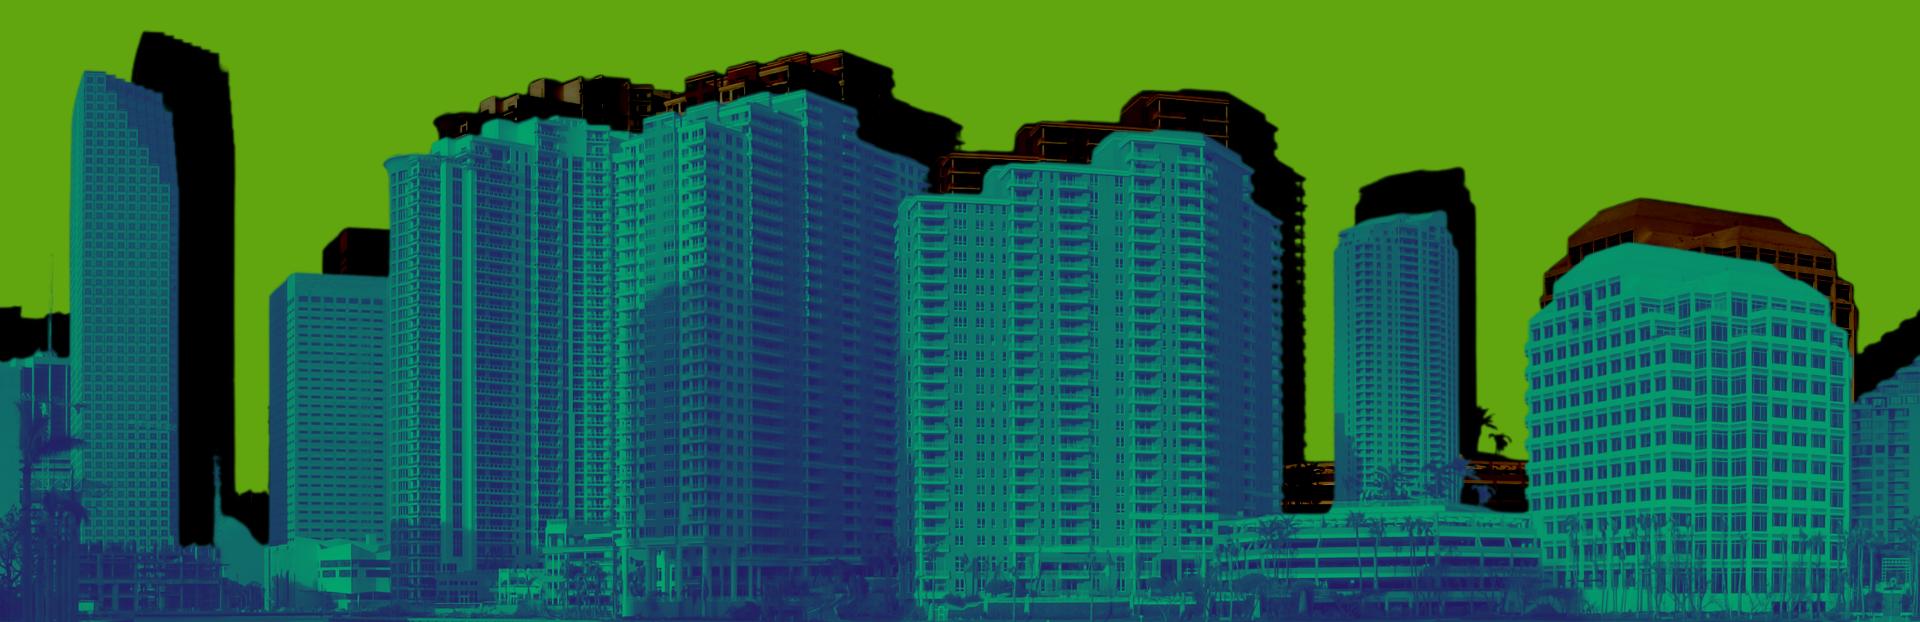 North Miami residents steering their own economic futures